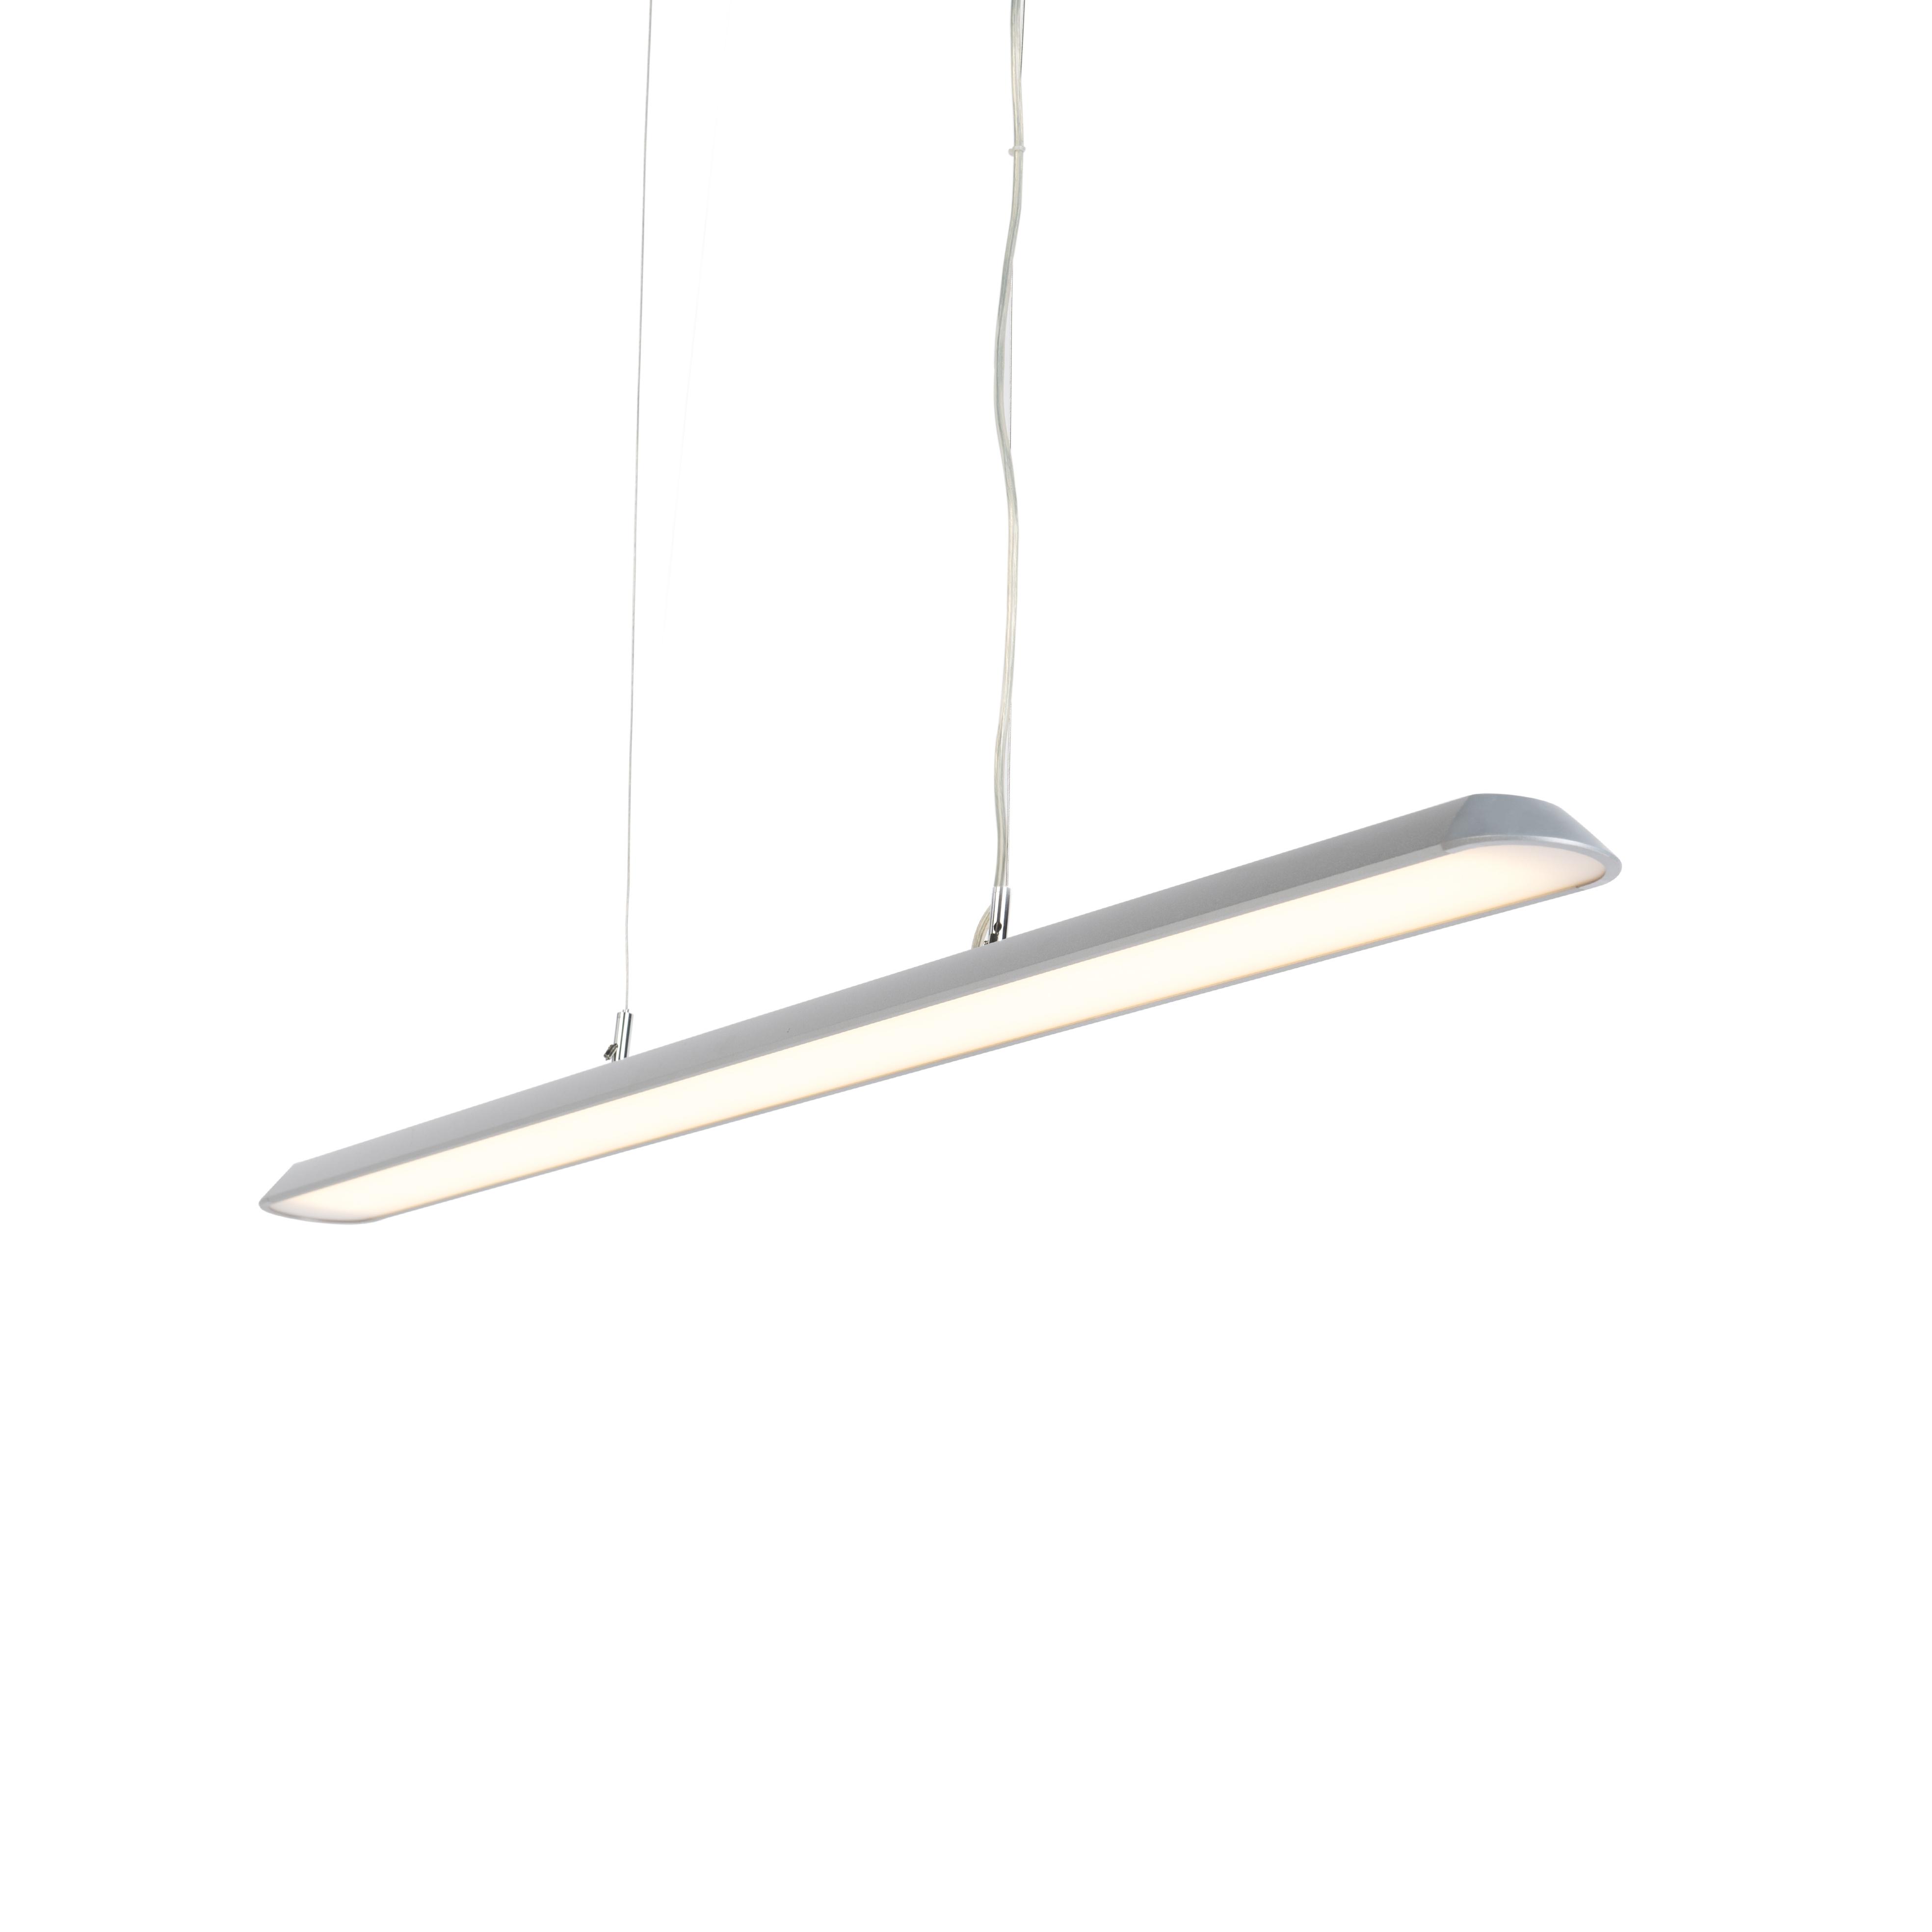 Moderne langwerpige hanglamp zilver 130cm incl. LED - Duct S